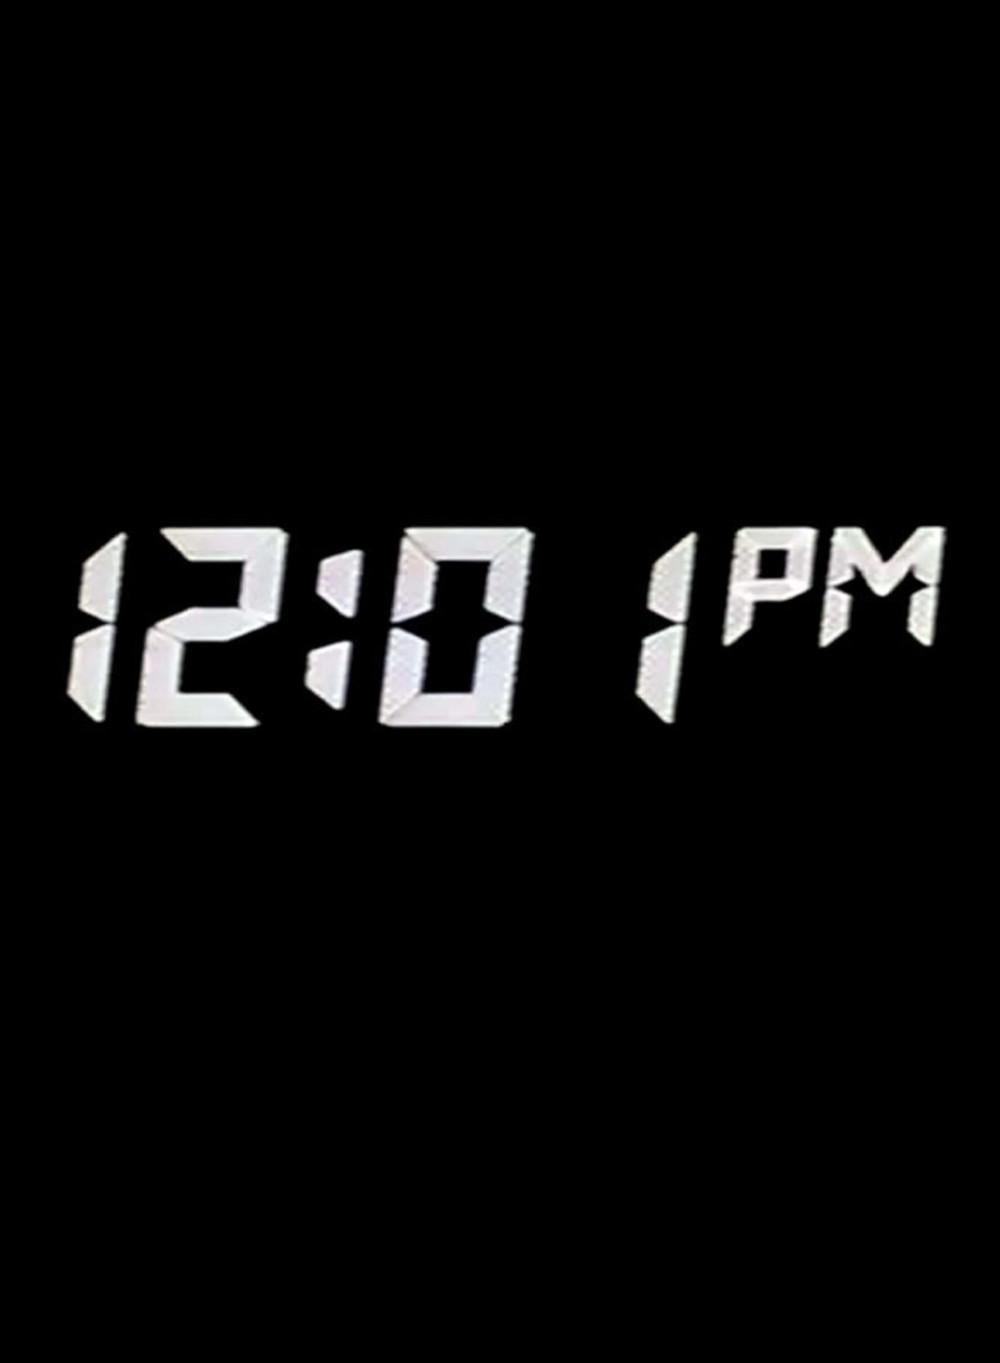 affiche du film 12:01 PM